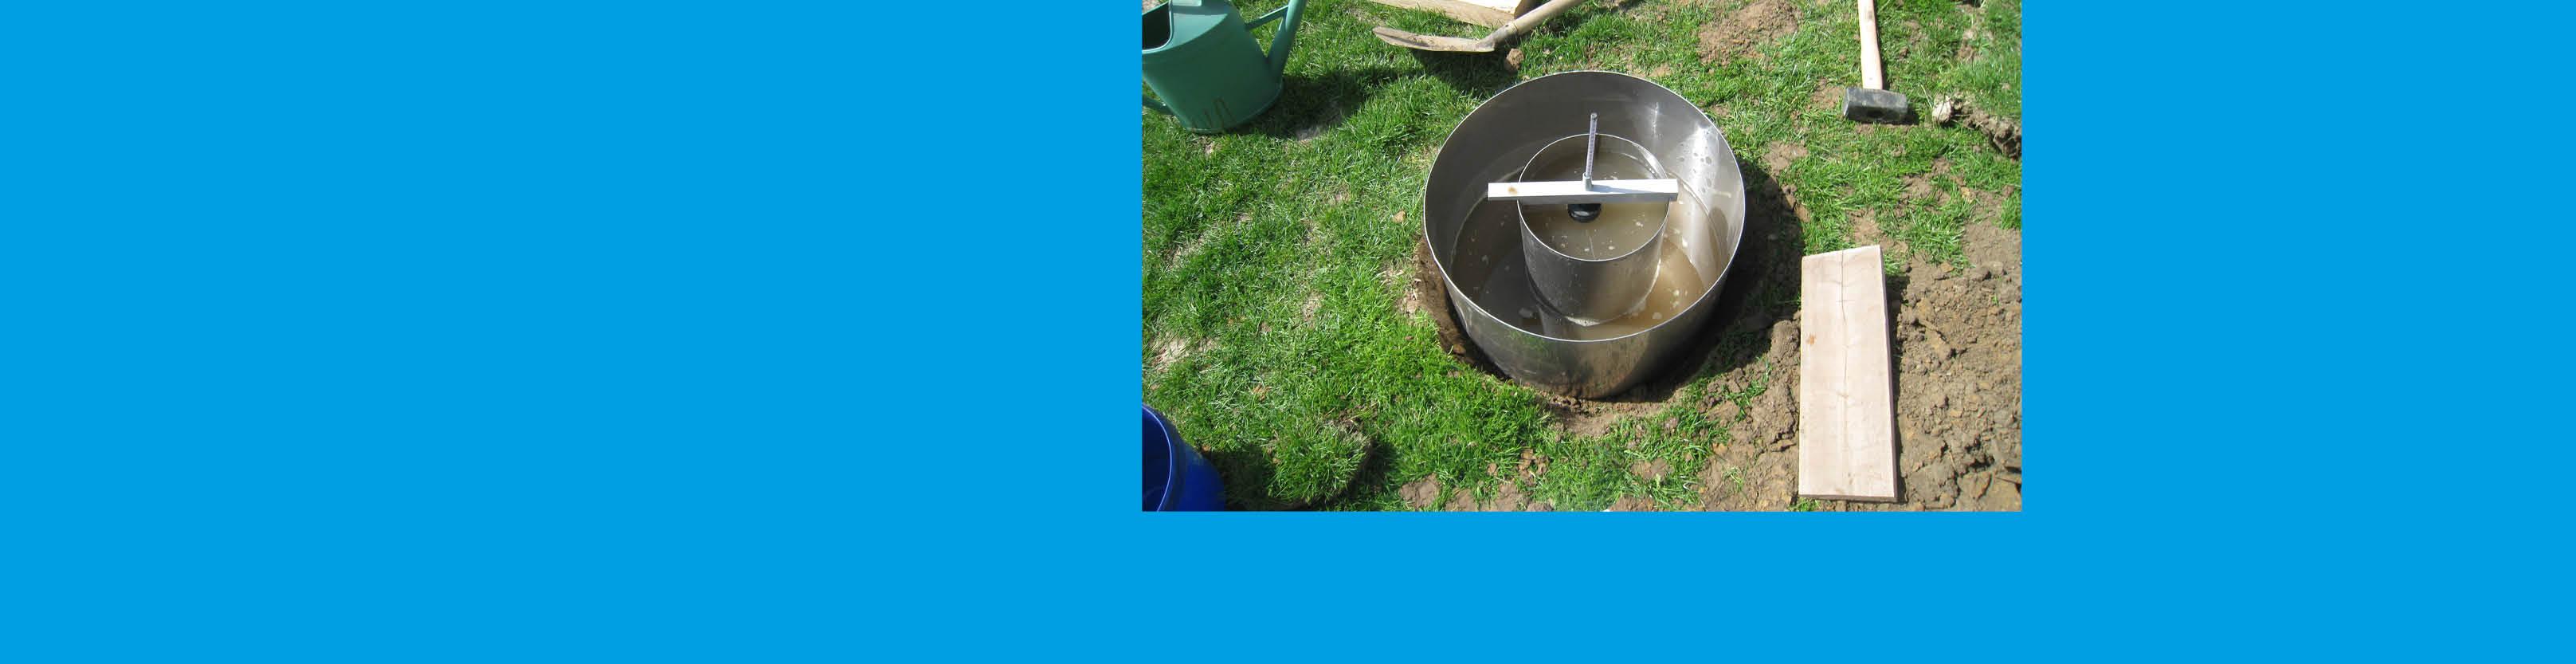 opmeting-waterdoorlaatbaarheid